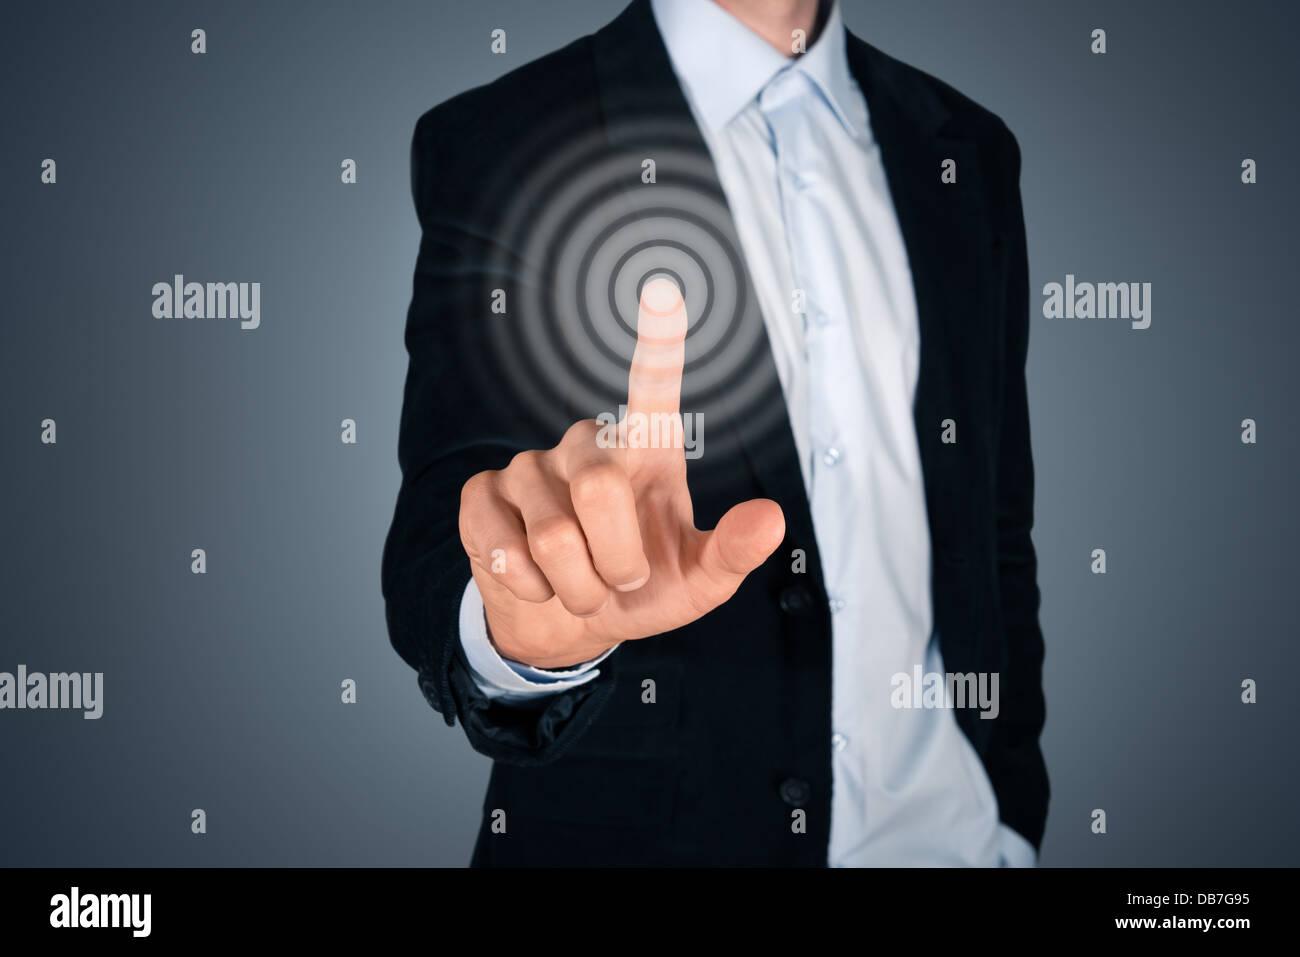 Retrato de la persona de negocios que tocar el botón de pantalla invisibles. Imagen concepto de pantalla táctil. Imagen De Stock